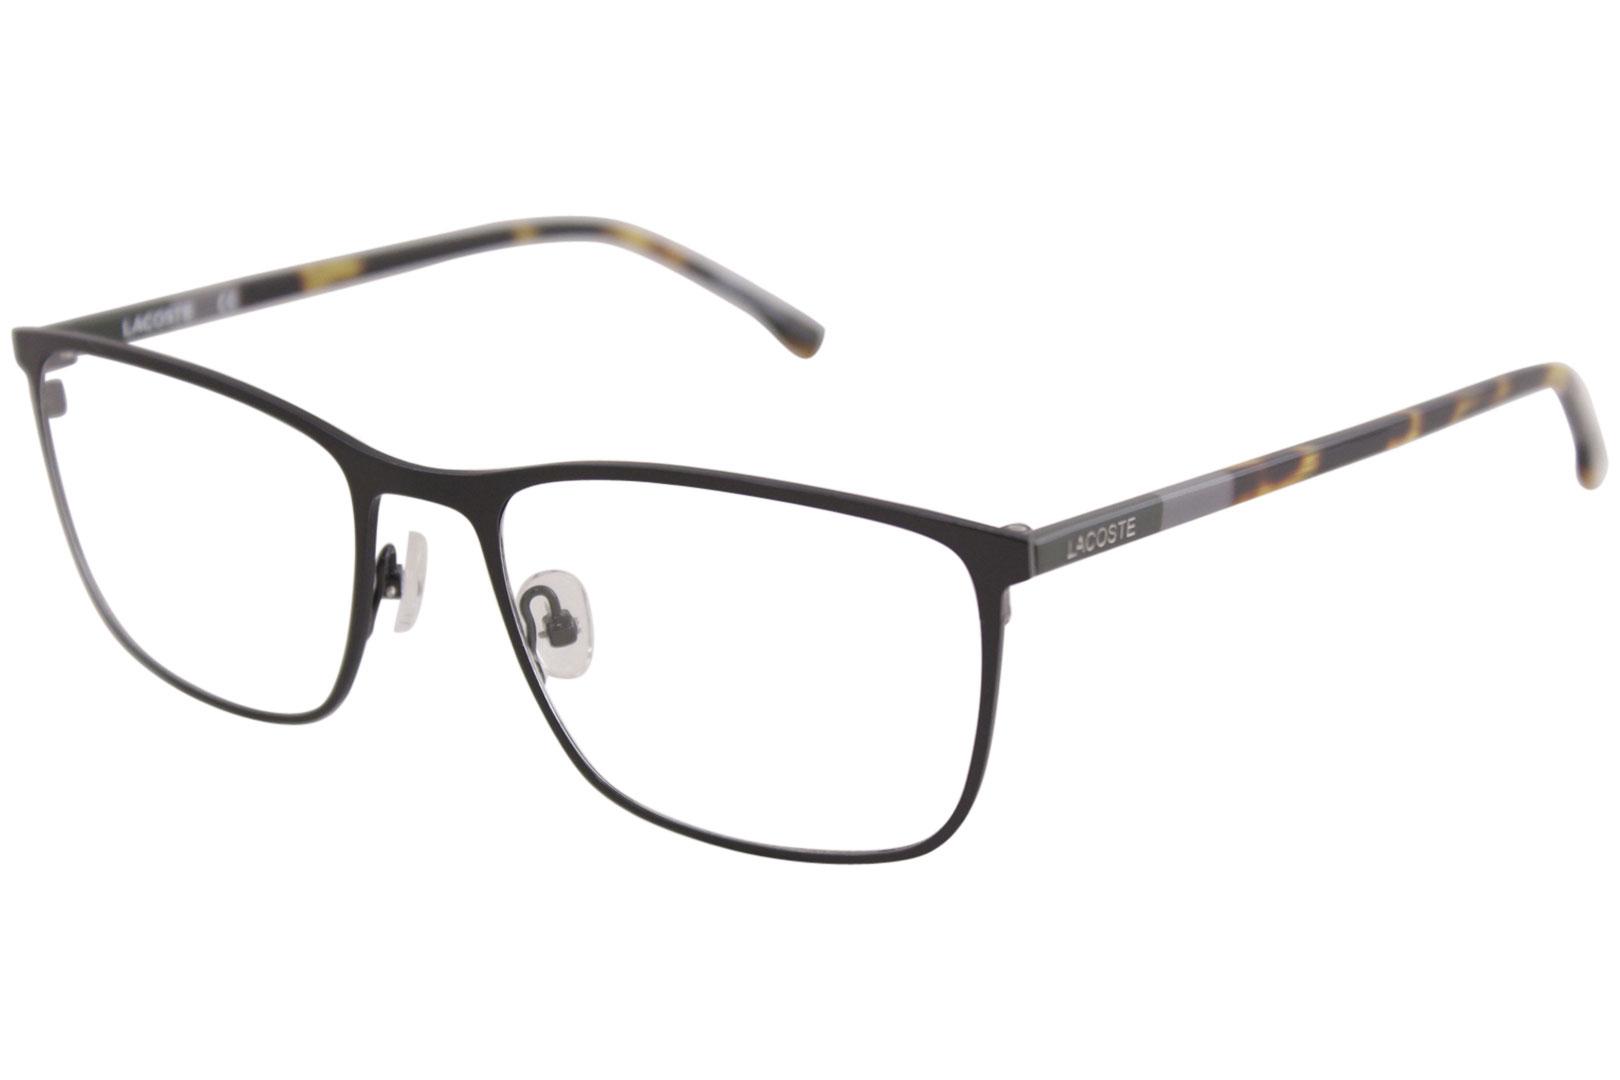 fc58804deb9f Lacoste Men s Eyeglasses L2247 L 2247 001 Black Full Rim Optical ...